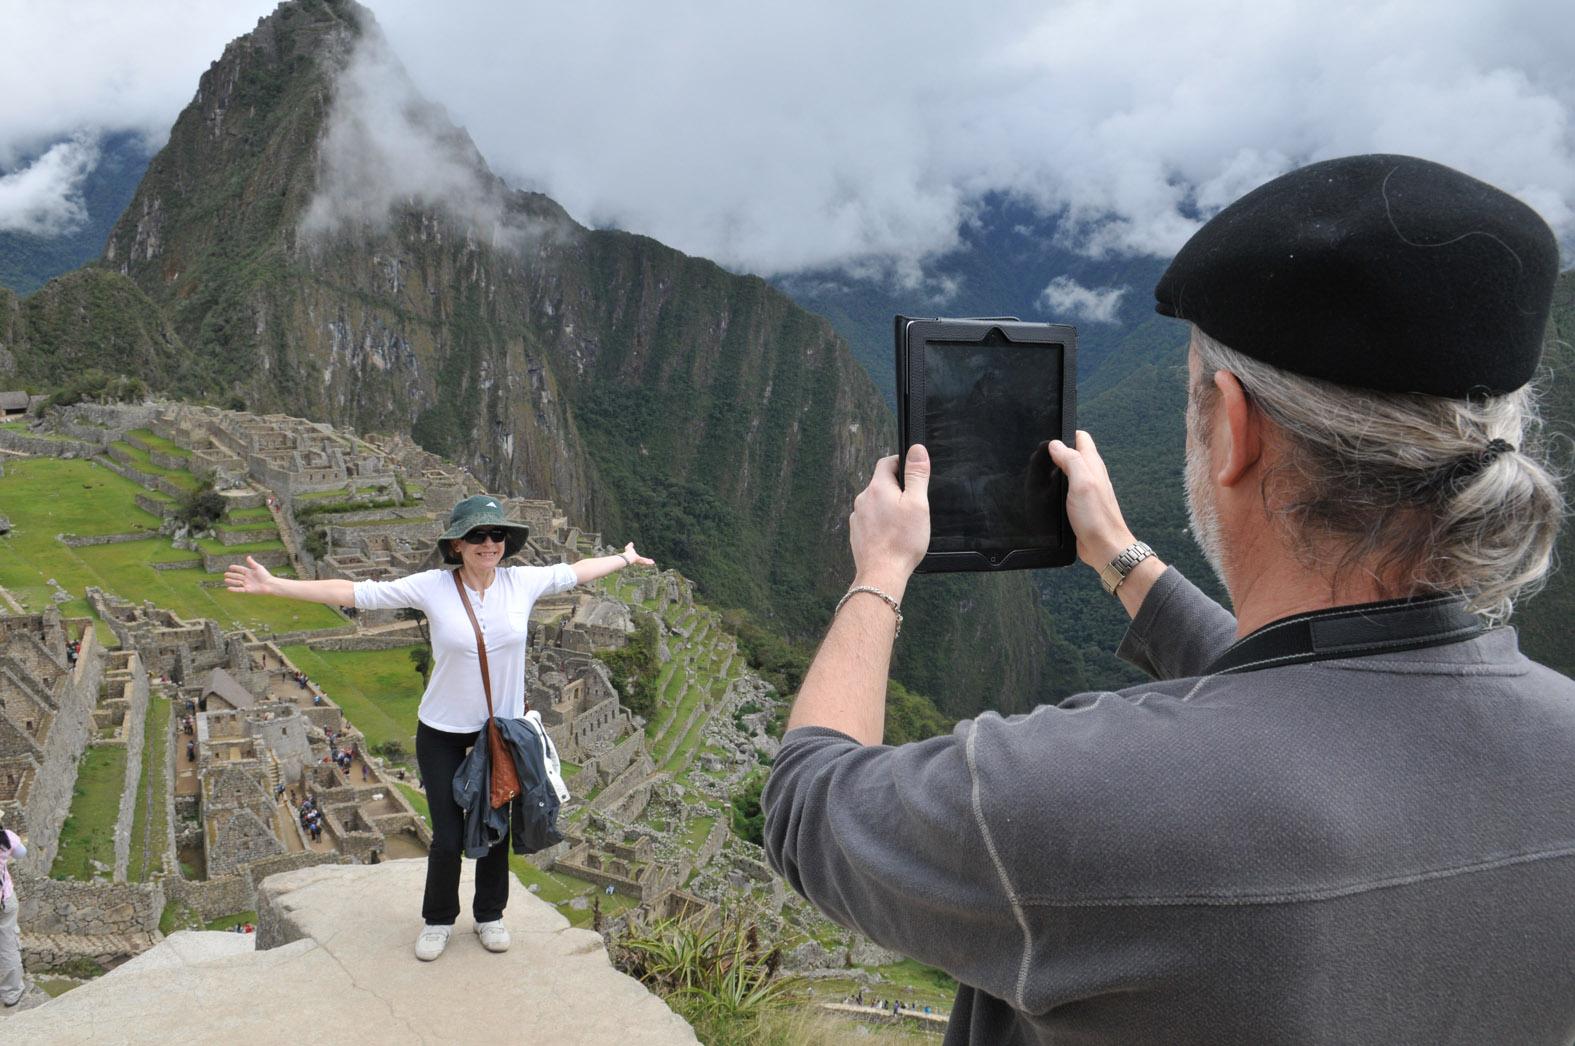 Salkantaygebergte met vrouw op rots en man die foto van haar maakt met iPad